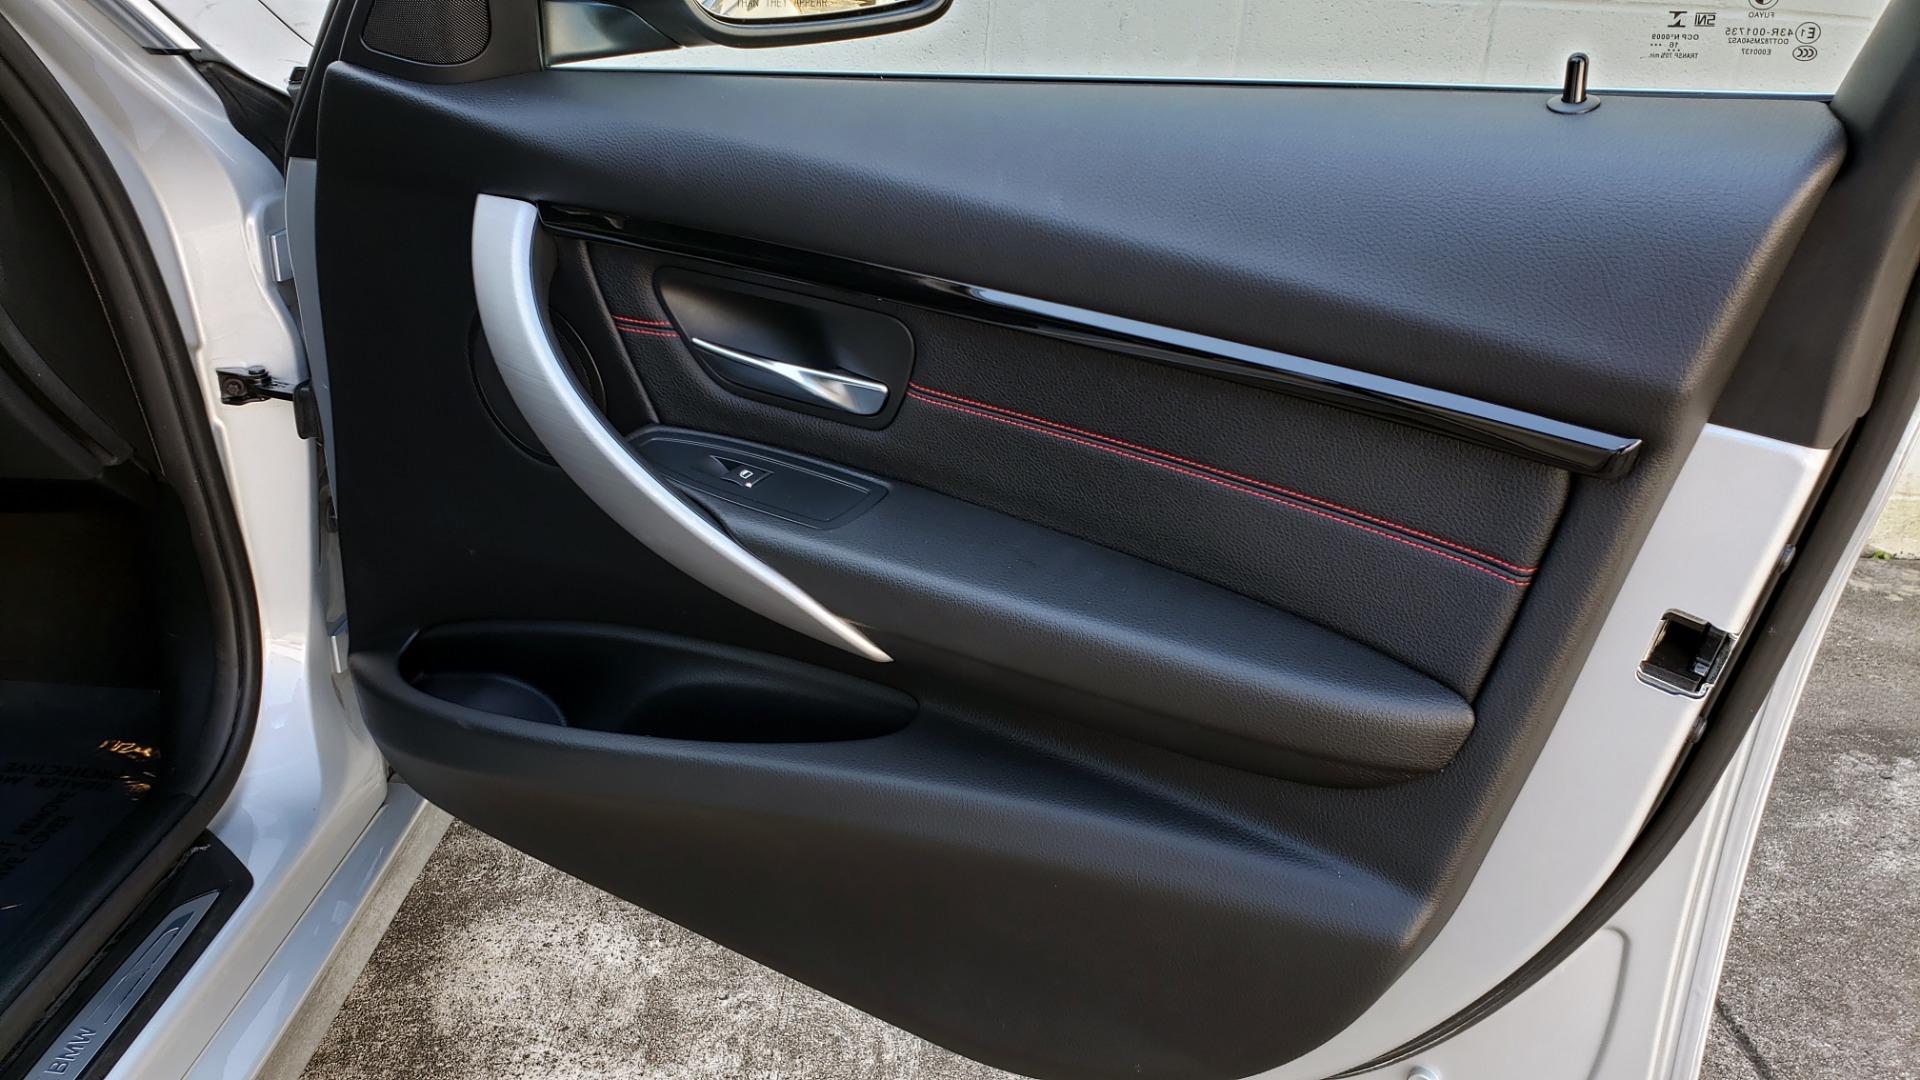 Used 2017 BMW 3 SERIES 330I SPORT SEDAN / DRVR ASST PKG / SUNROOF / REARVIEW for sale Sold at Formula Imports in Charlotte NC 28227 62